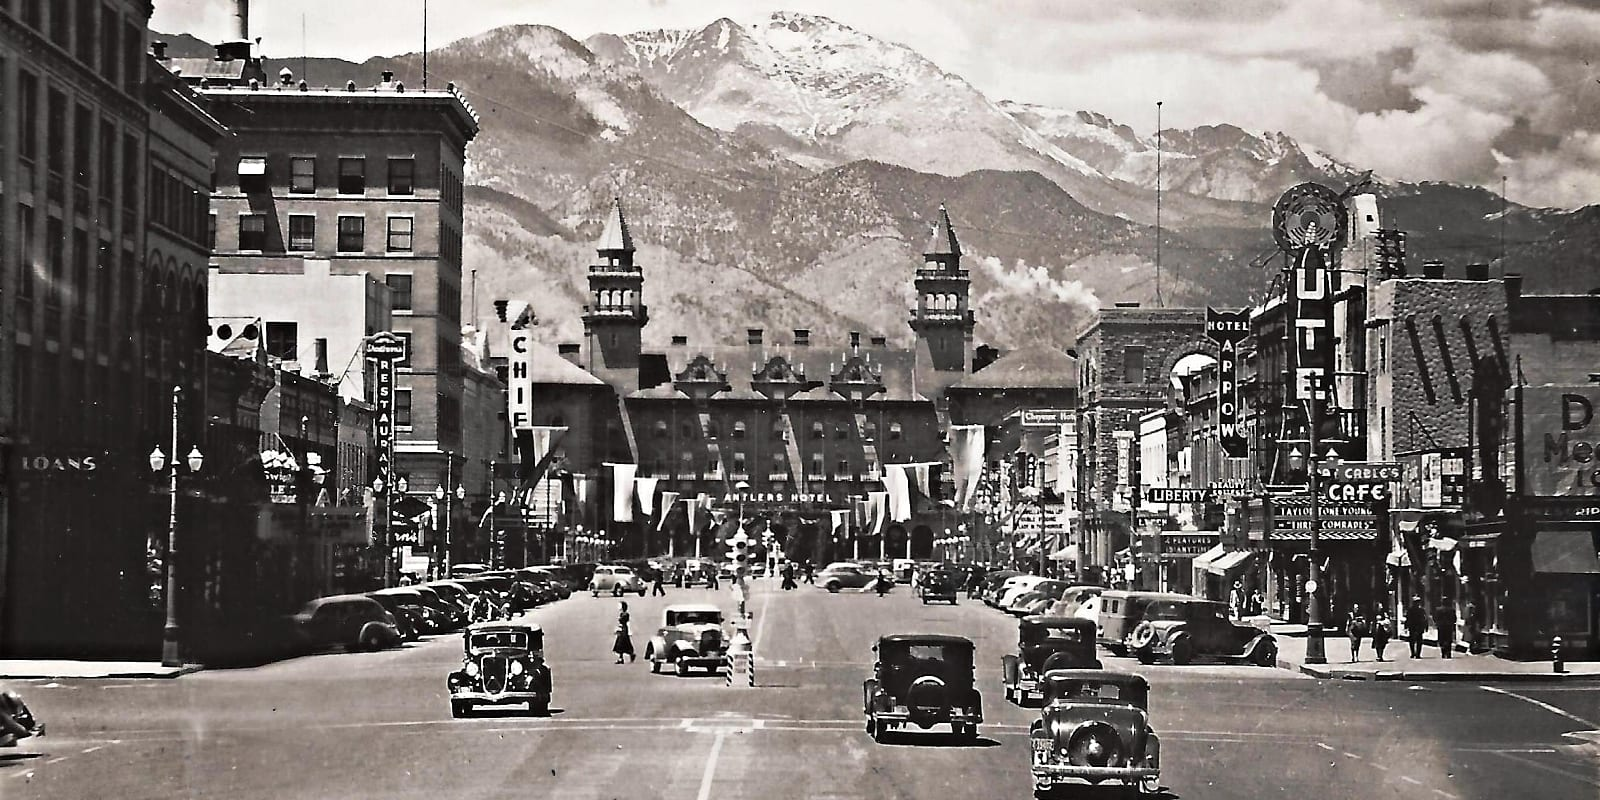 Colorado Springs History Facts Antler Hotel Downtown Circa 1940s